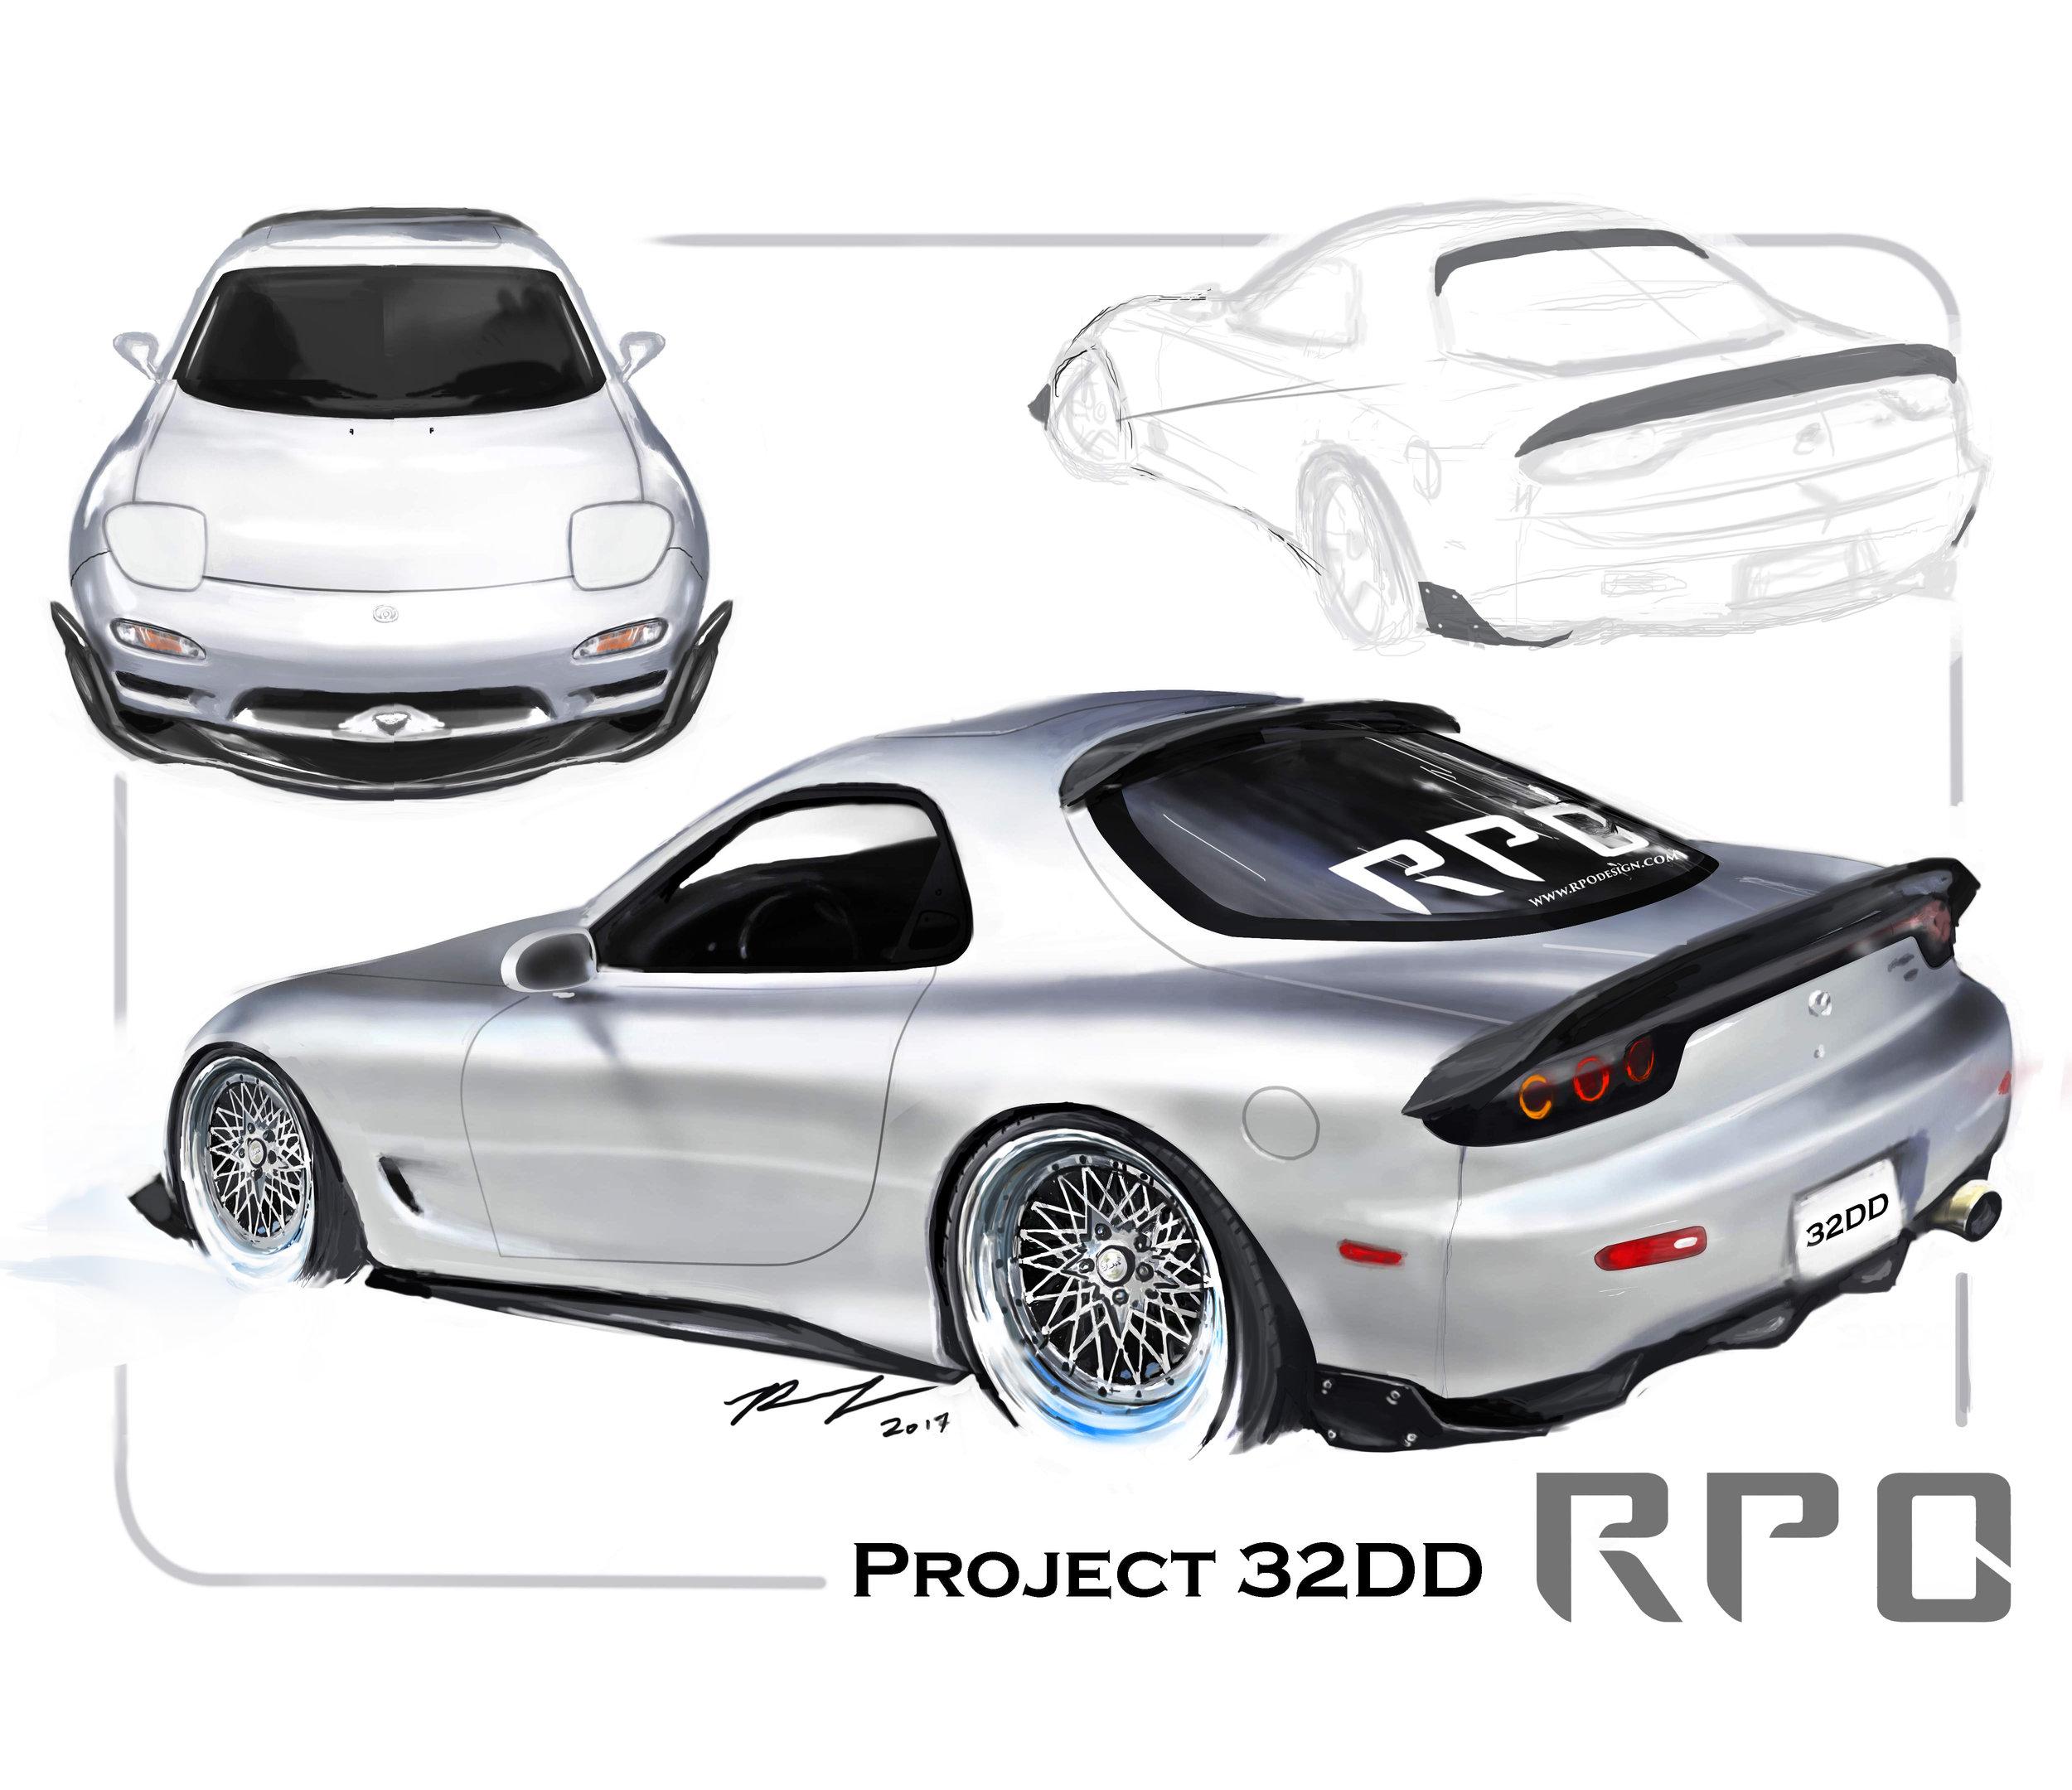 RPO Aero Kit.jpg